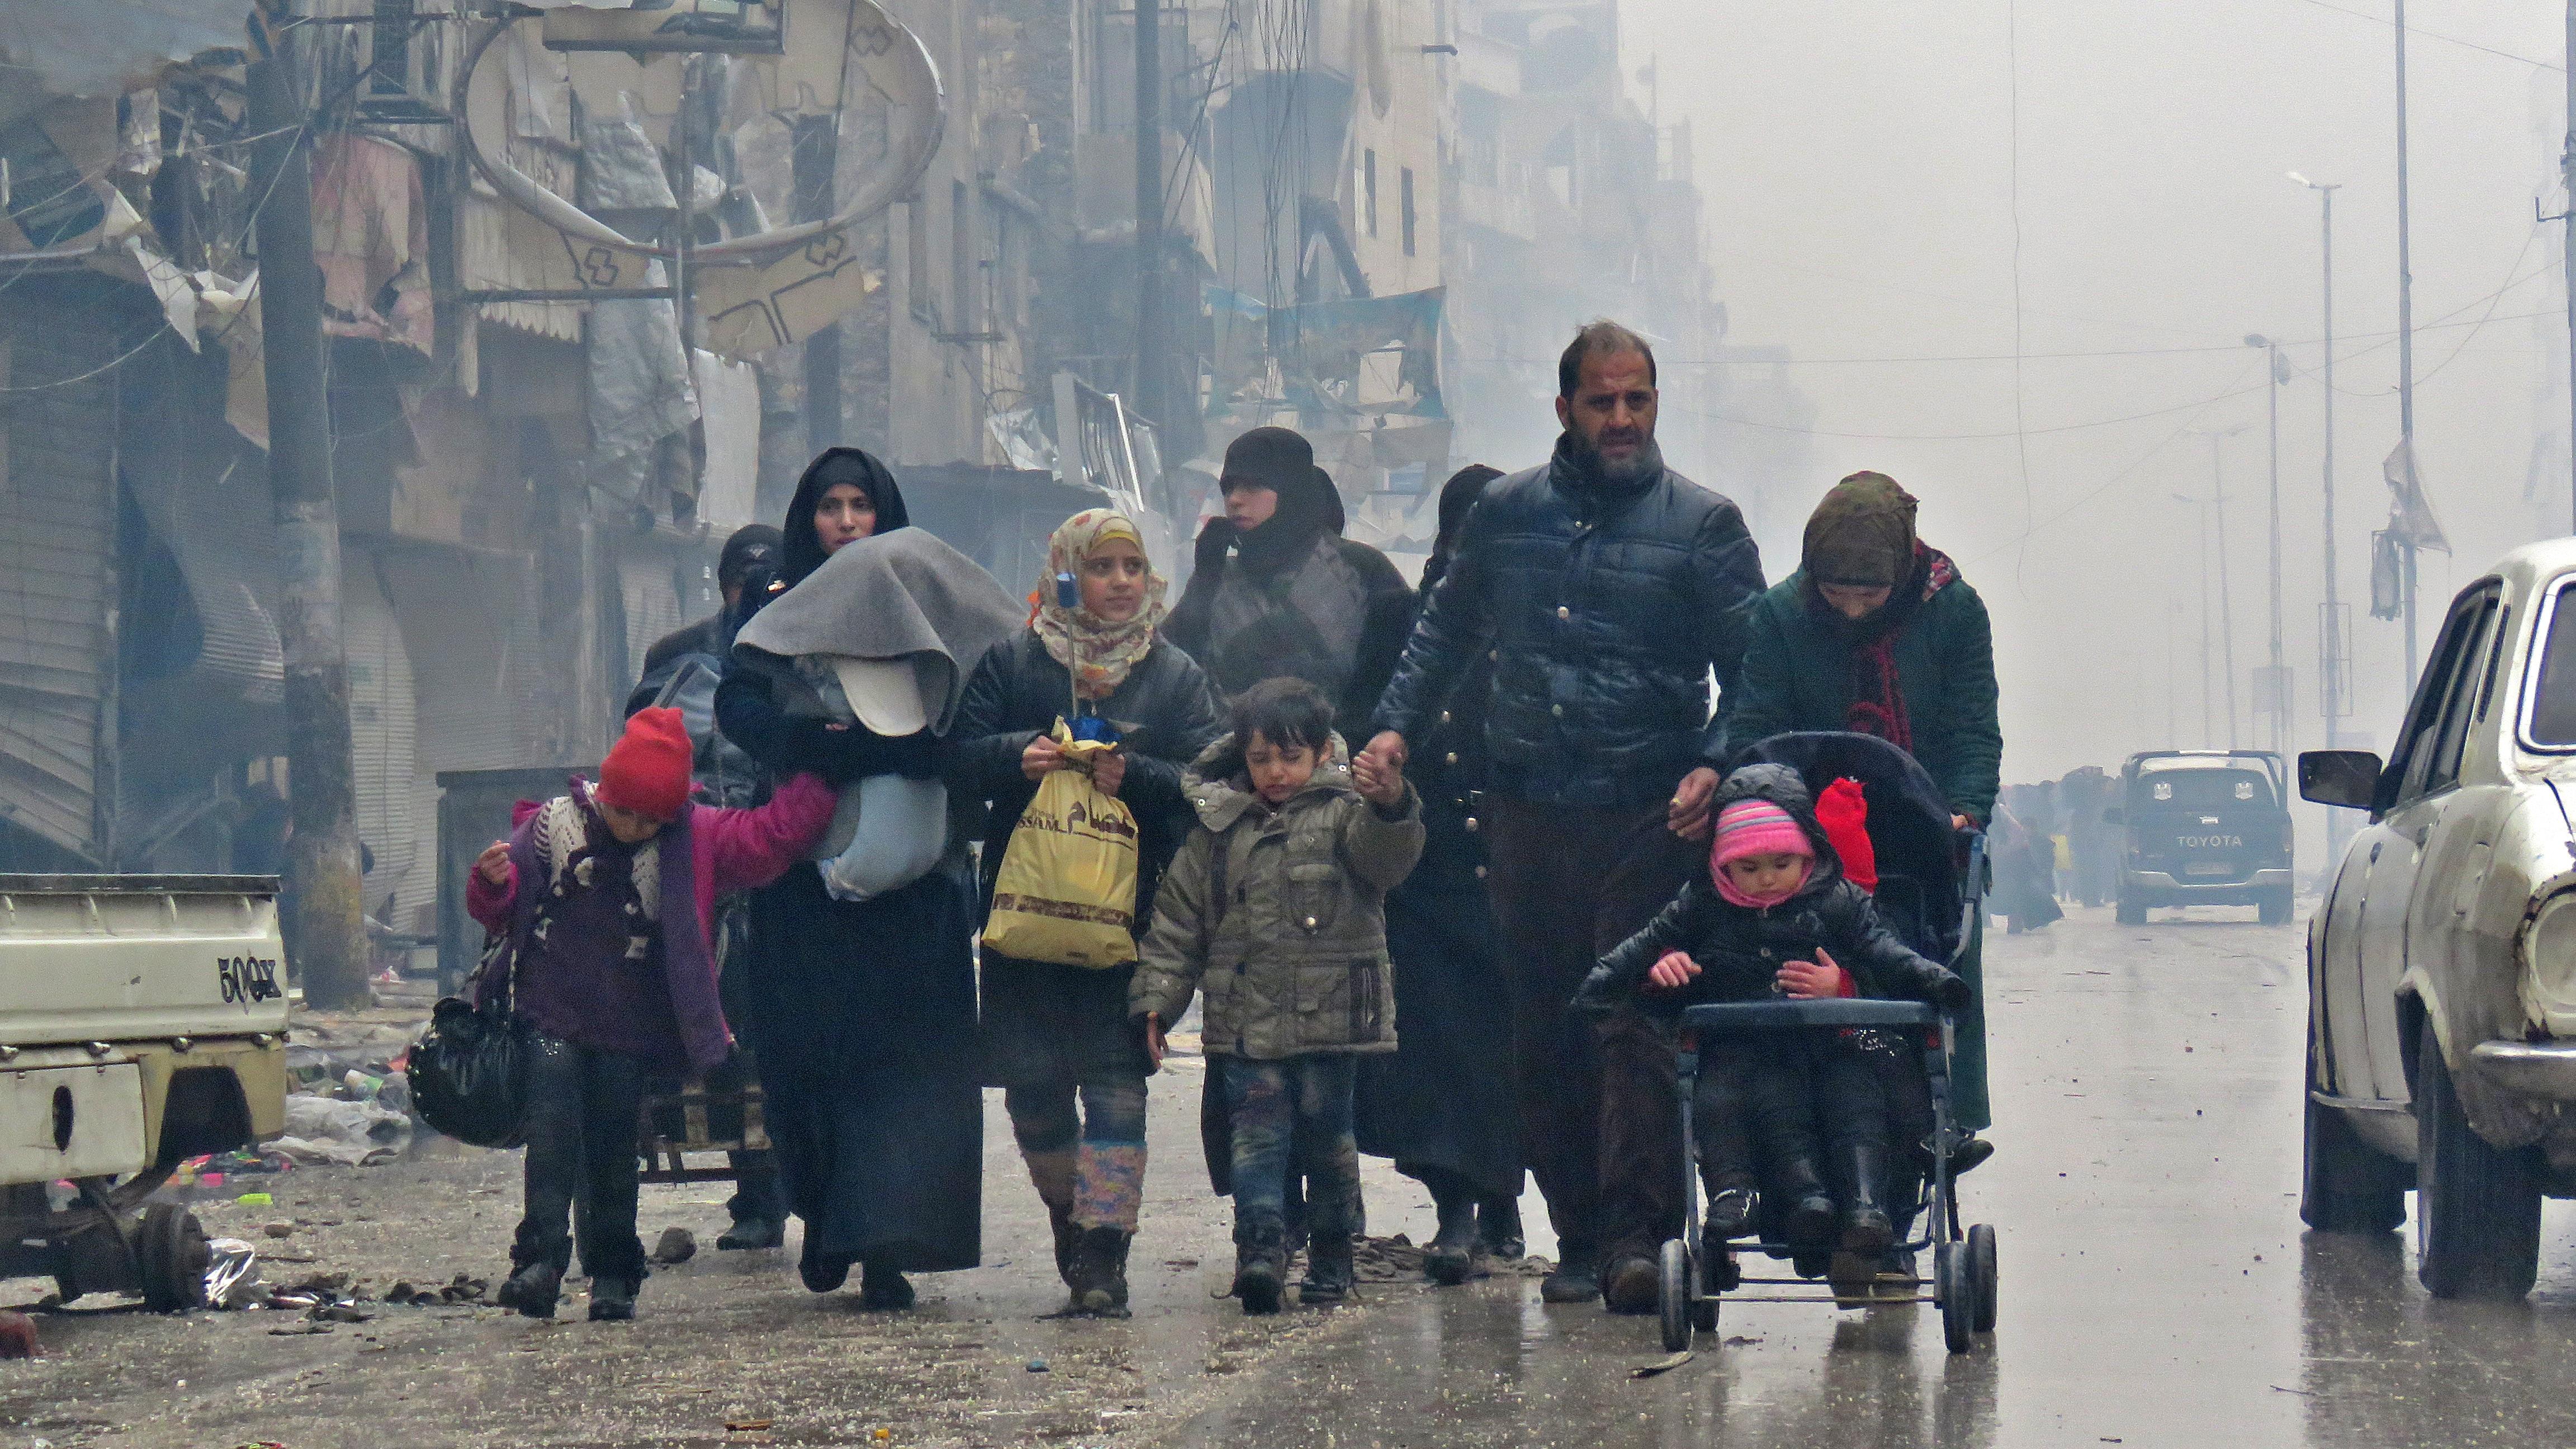 Syrian residents, fleeing violence in the restive Bustan al-Qasr neighbourhood, arrive in Aleppo's Fardos neighbourhood. Image credit: AFP